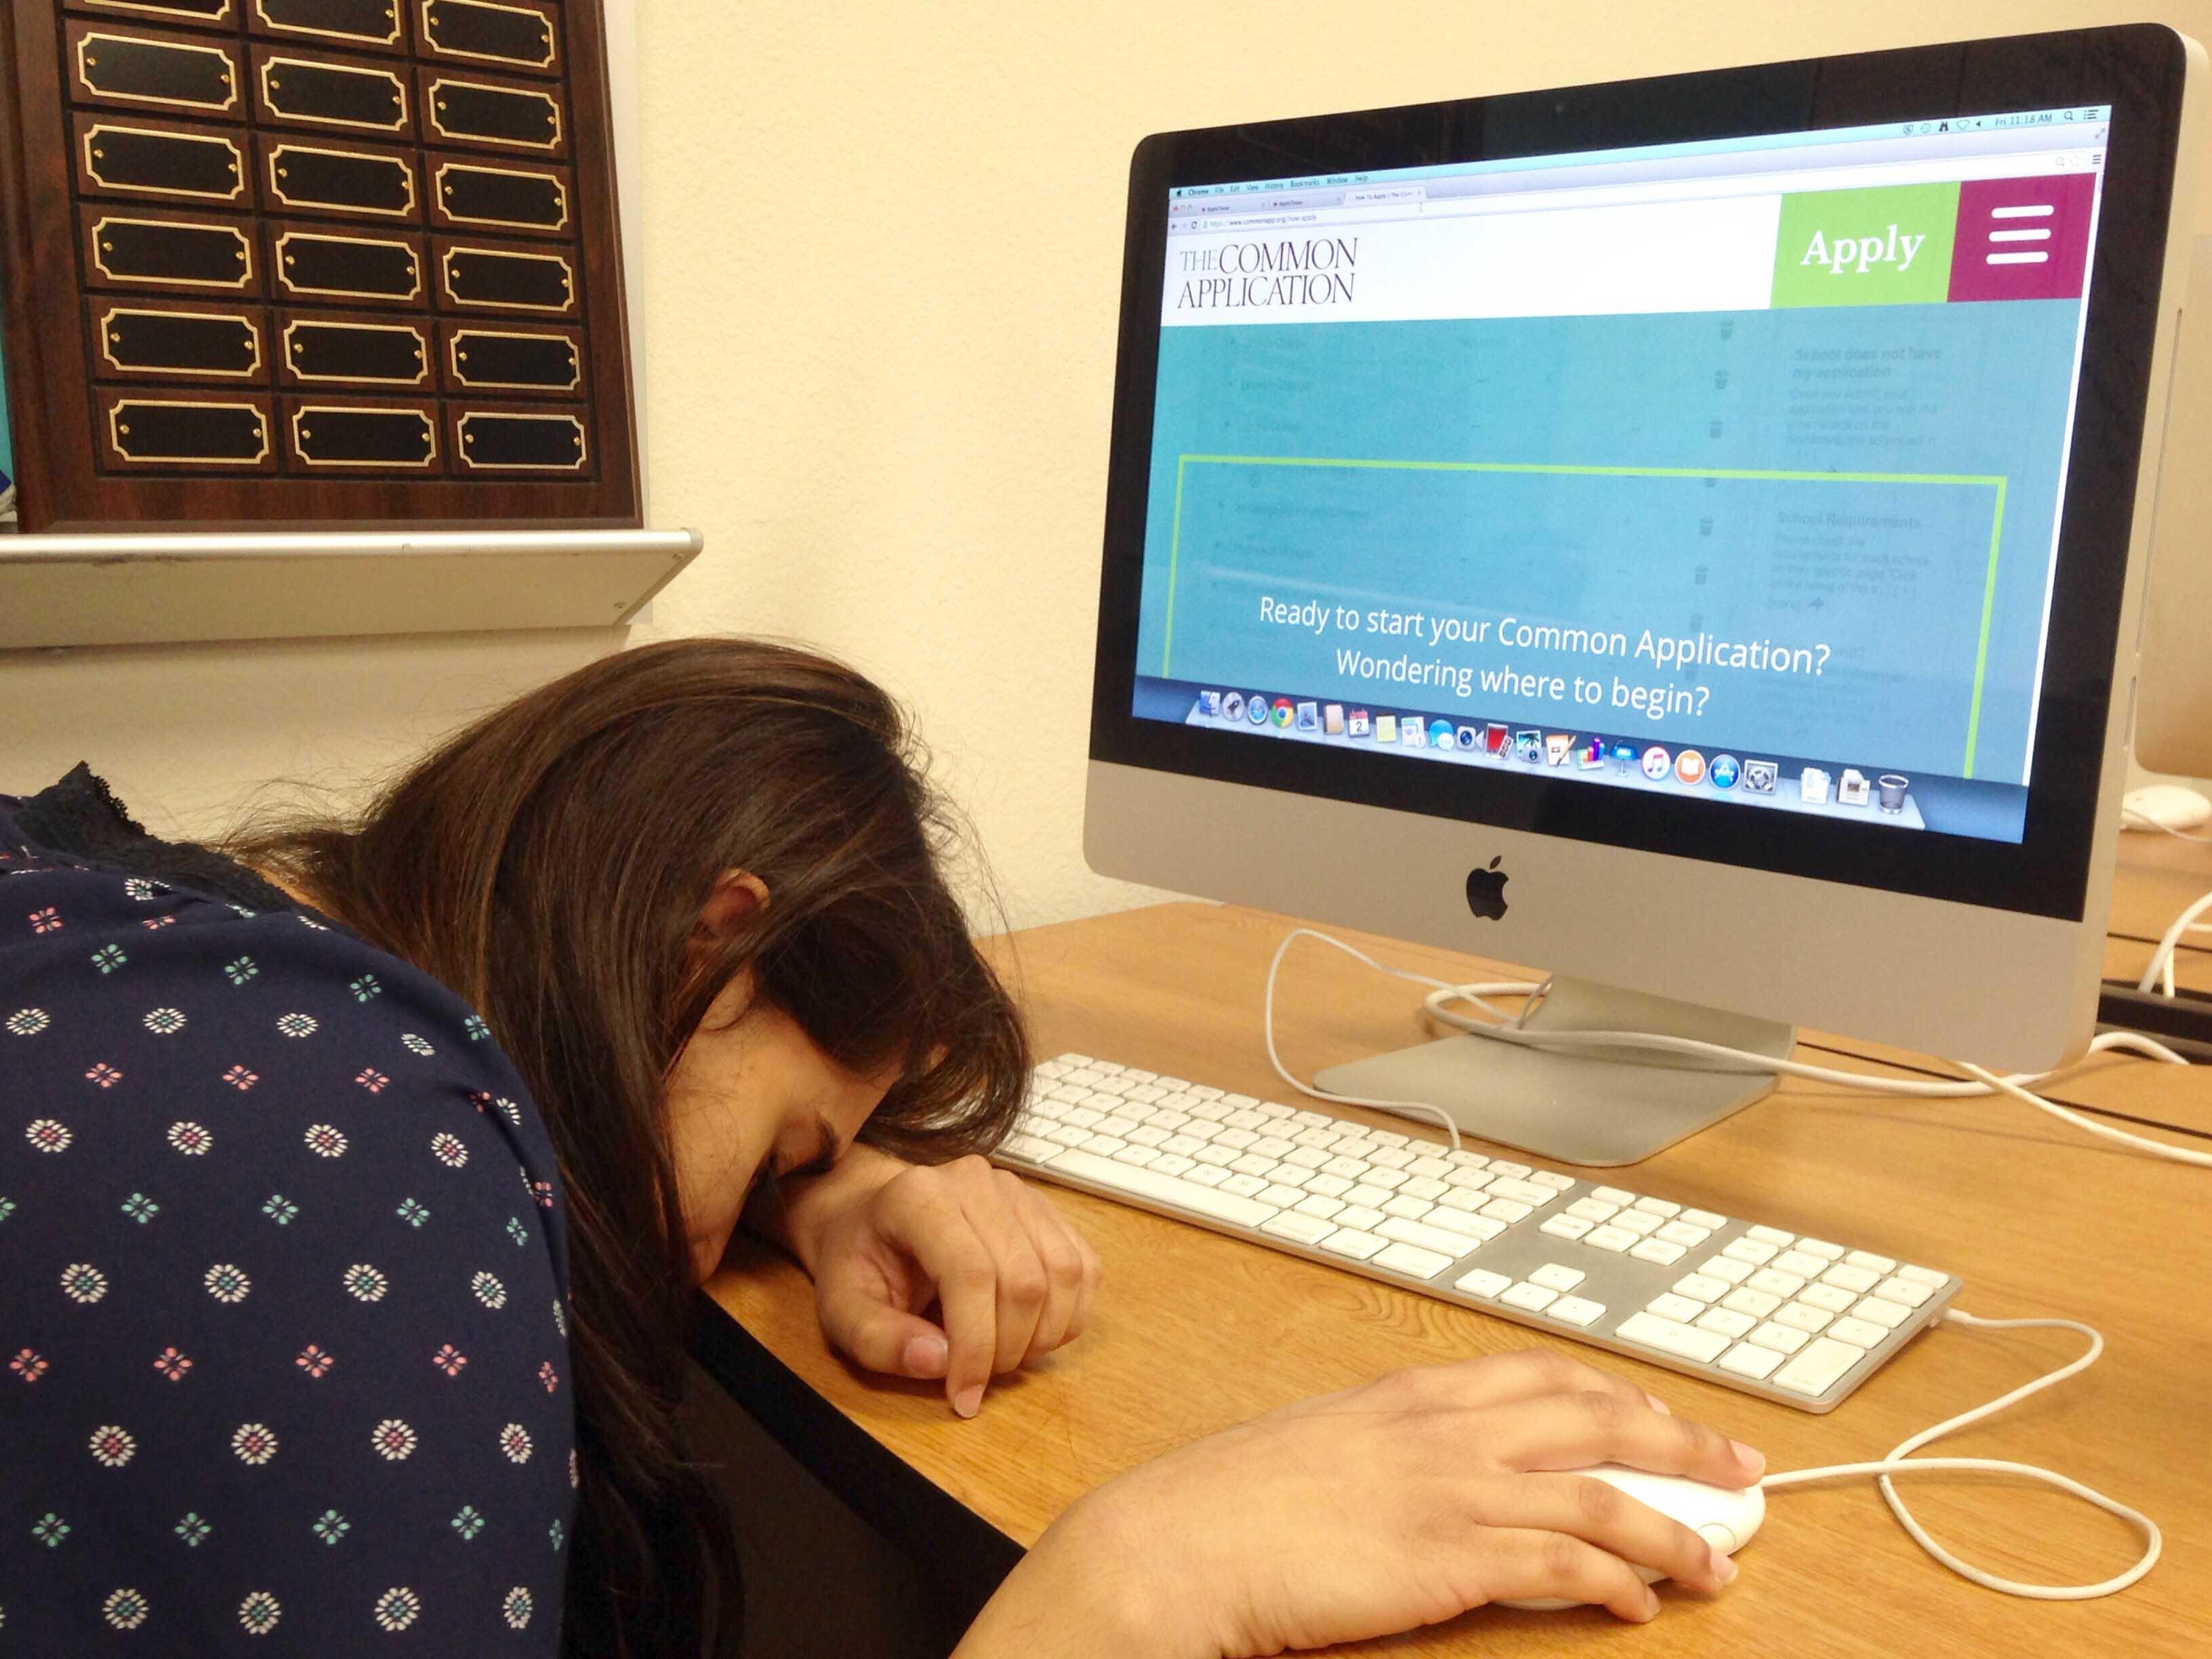 Guest contributor Kharisma Pritchett Braxton thinks teachers should be more understanding about handing out homework.